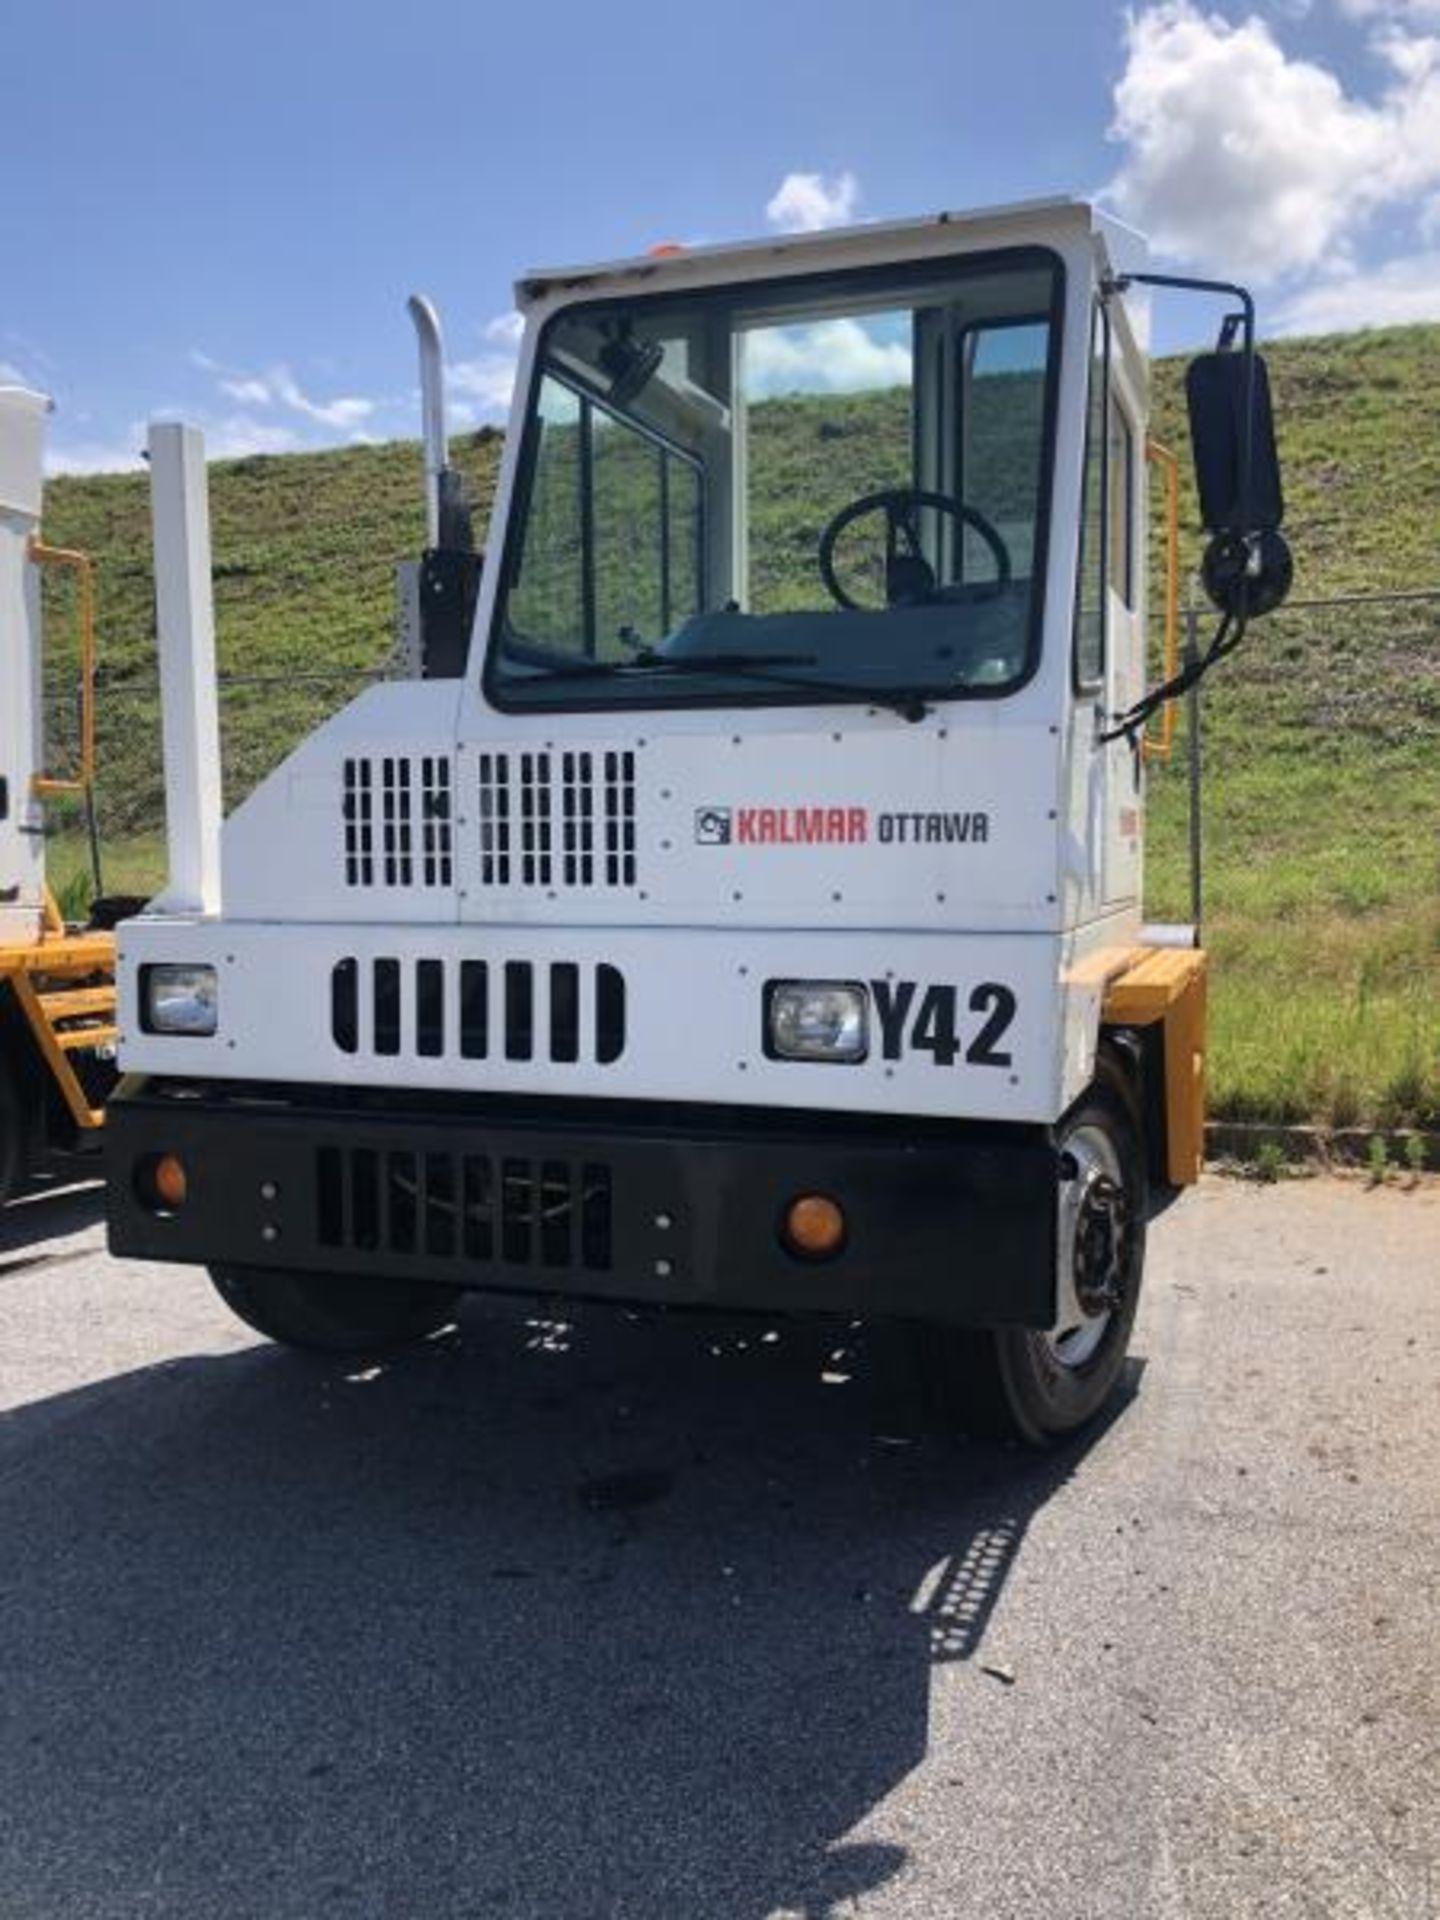 2015 Kalmar Ottawa 4x2 Yard Truck , SN: 338836 1,939.0 Hours, 1,961 Miles - Image 32 of 33